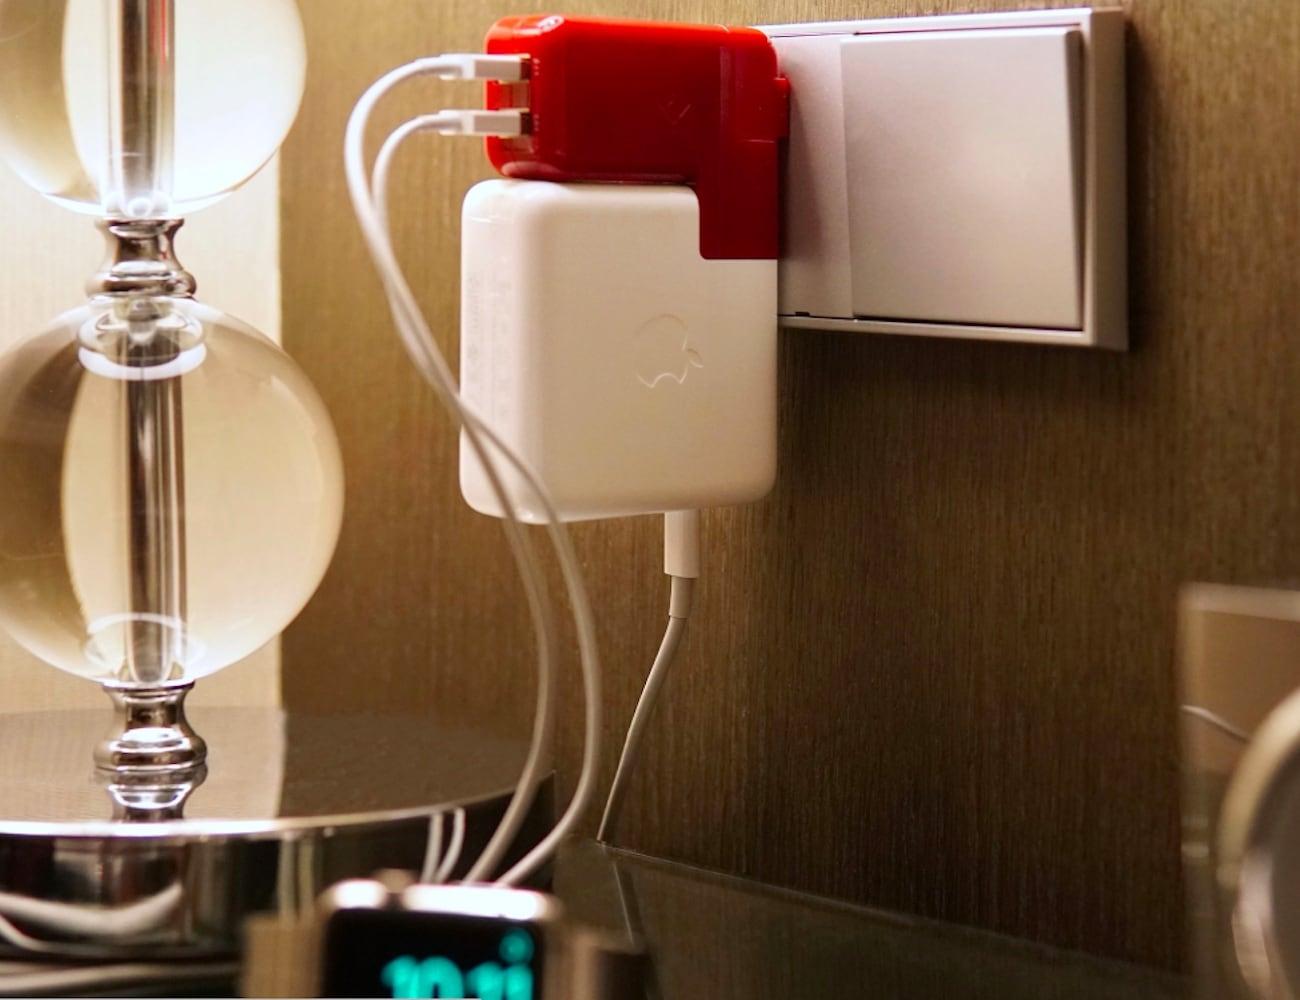 TwelveSouth PlugBug Duo MacBook Travel Adapter